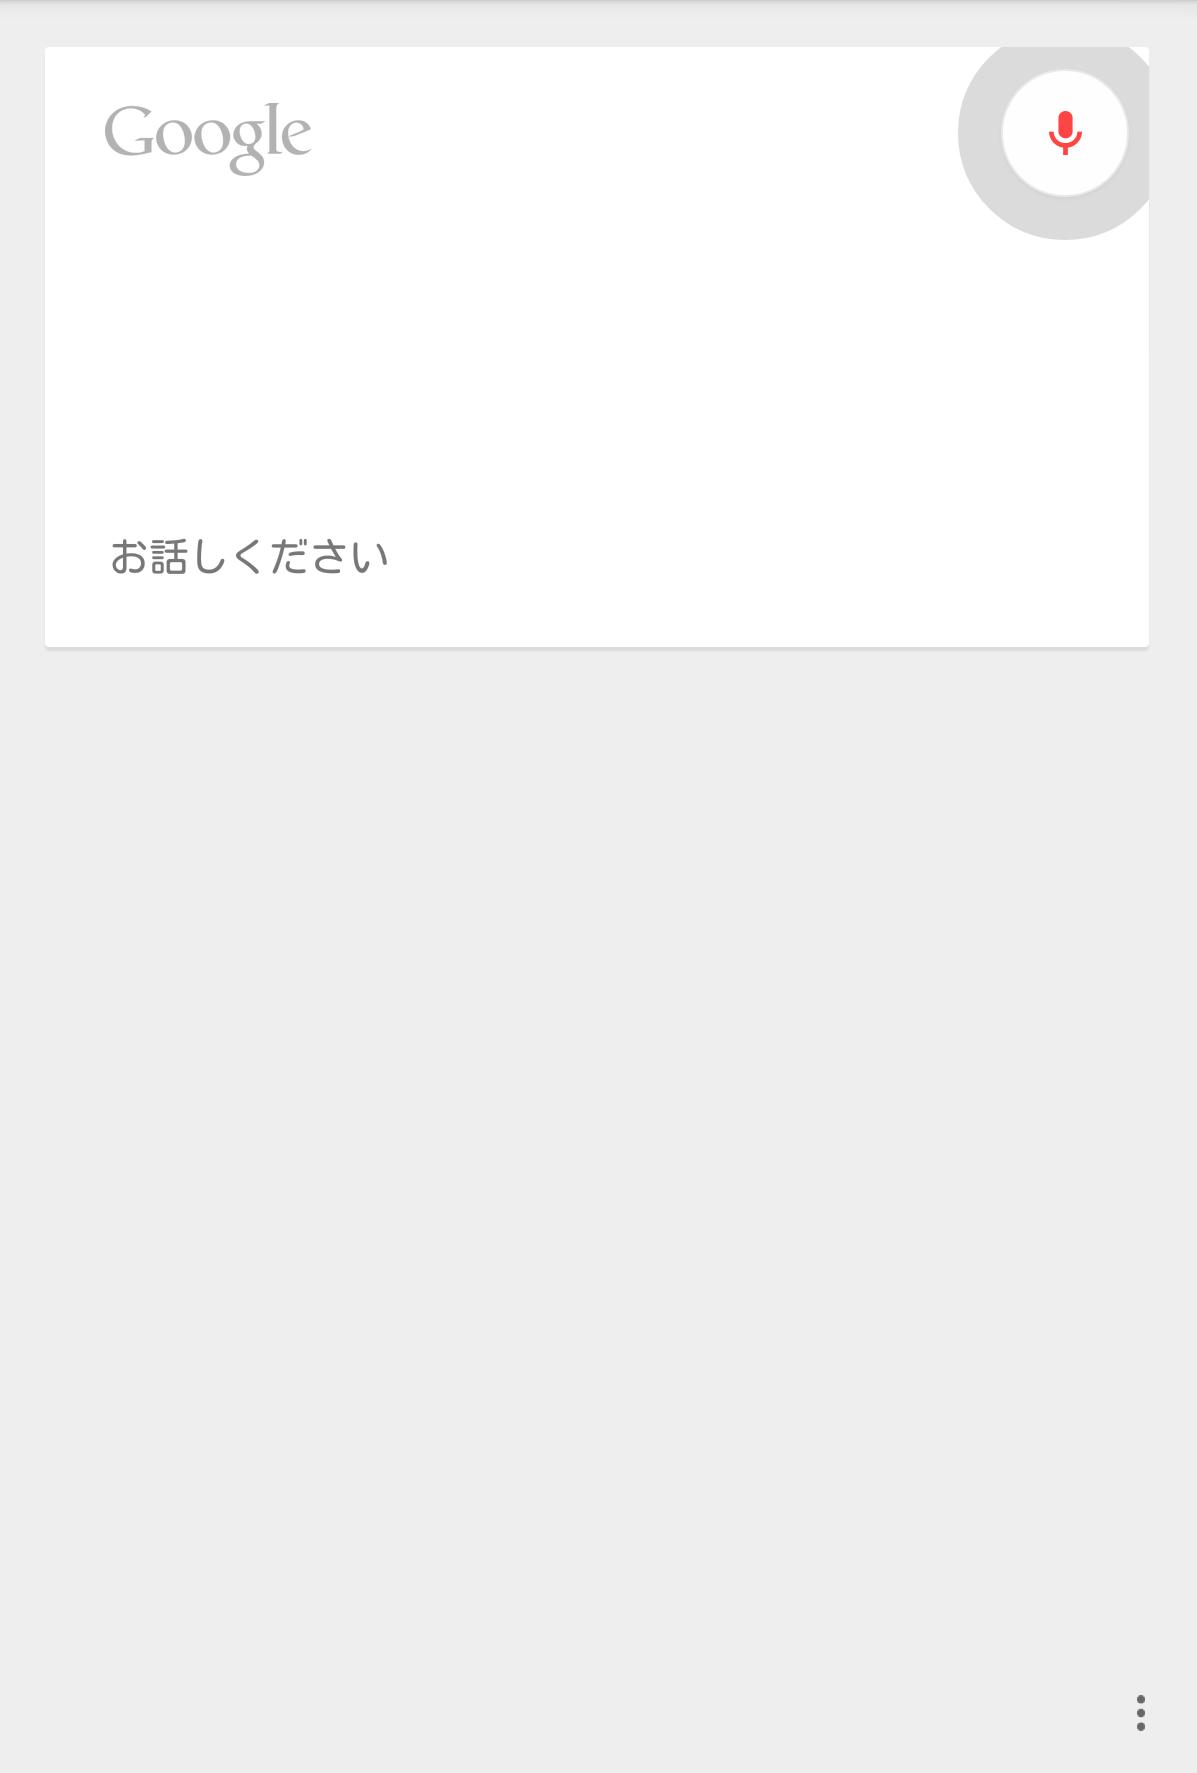 okgoogle20140702006.png